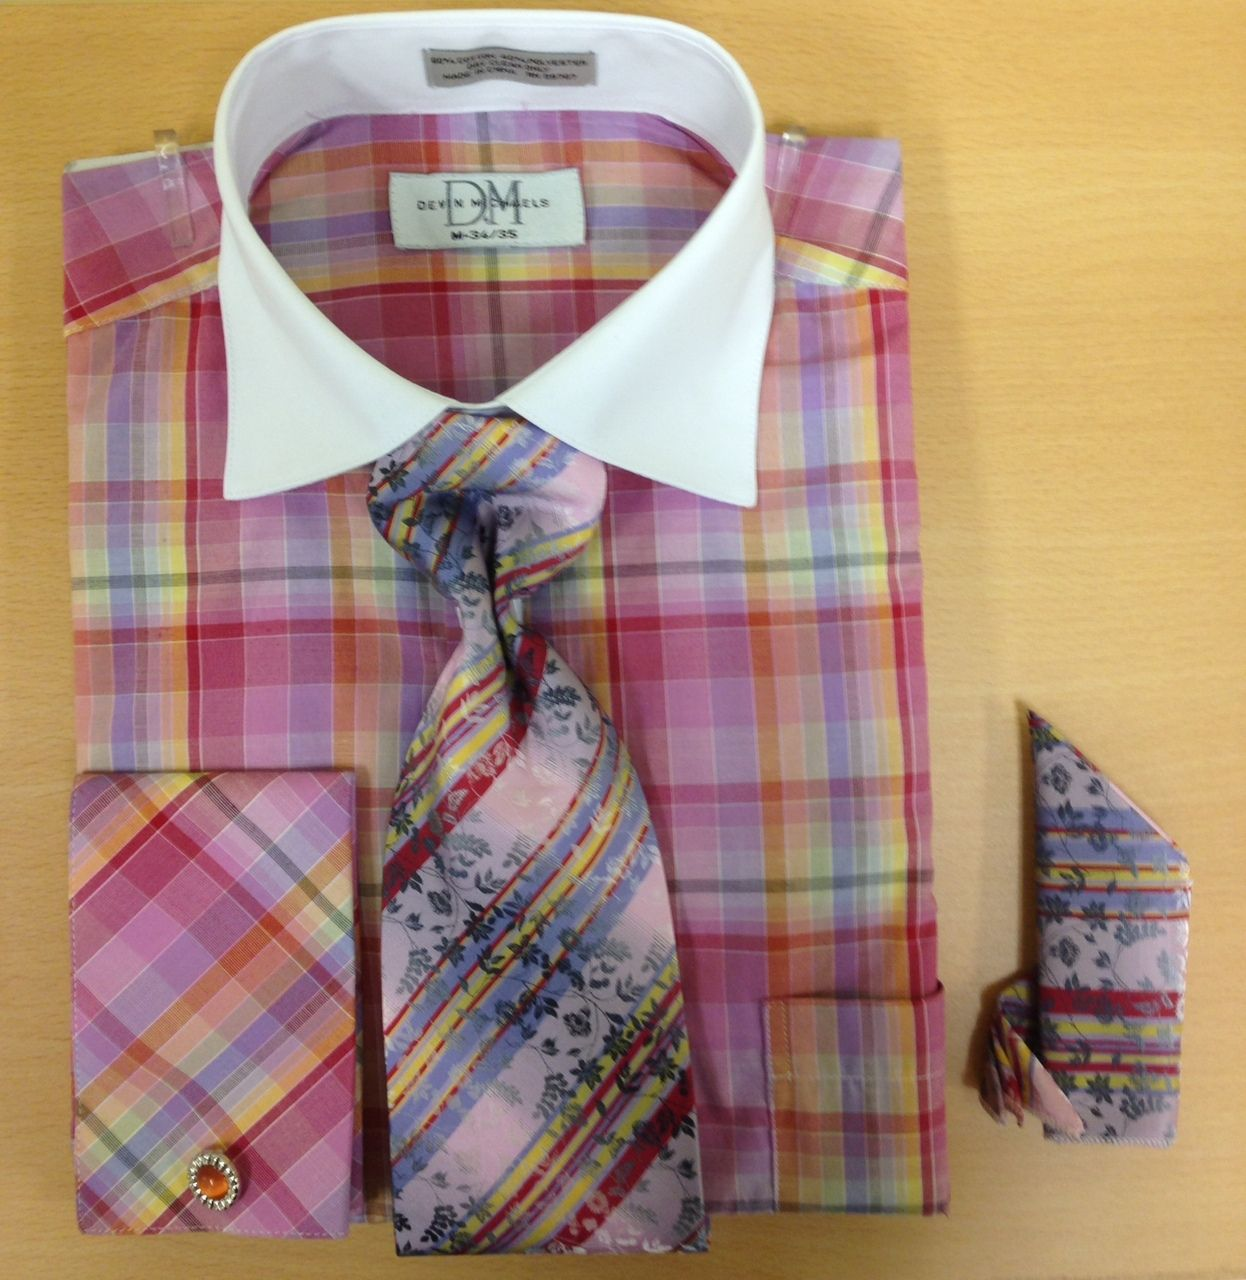 Men's Fashion Madras Plaid Cufflink Dress Shirt Set - Pink/Gold